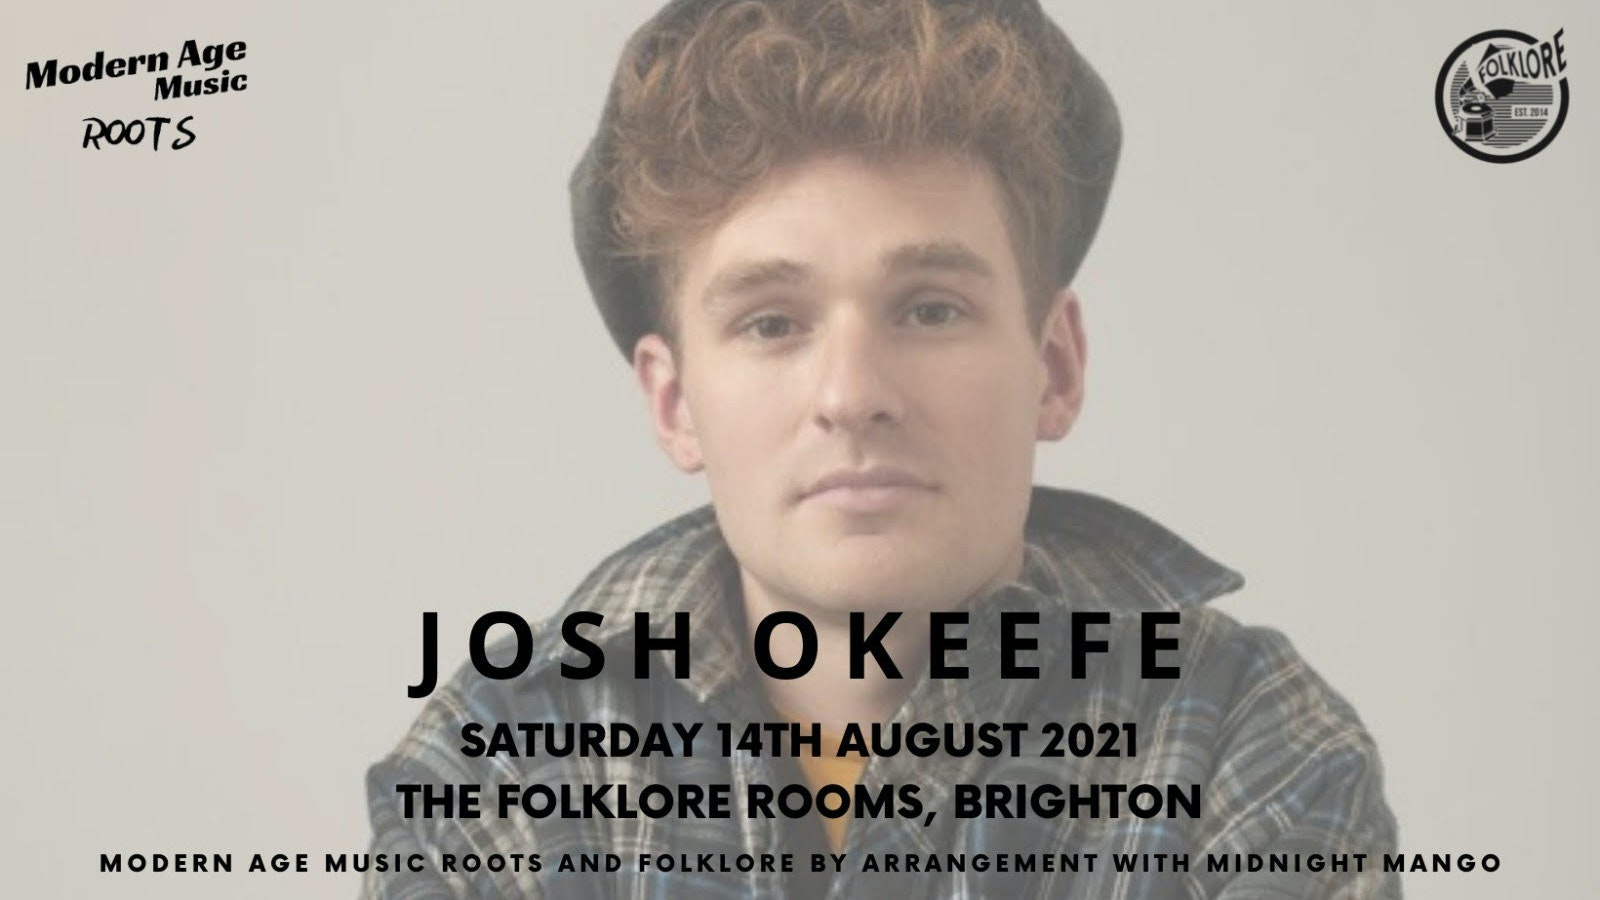 Josh Okeefe – The Folklore Rooms, Brighton